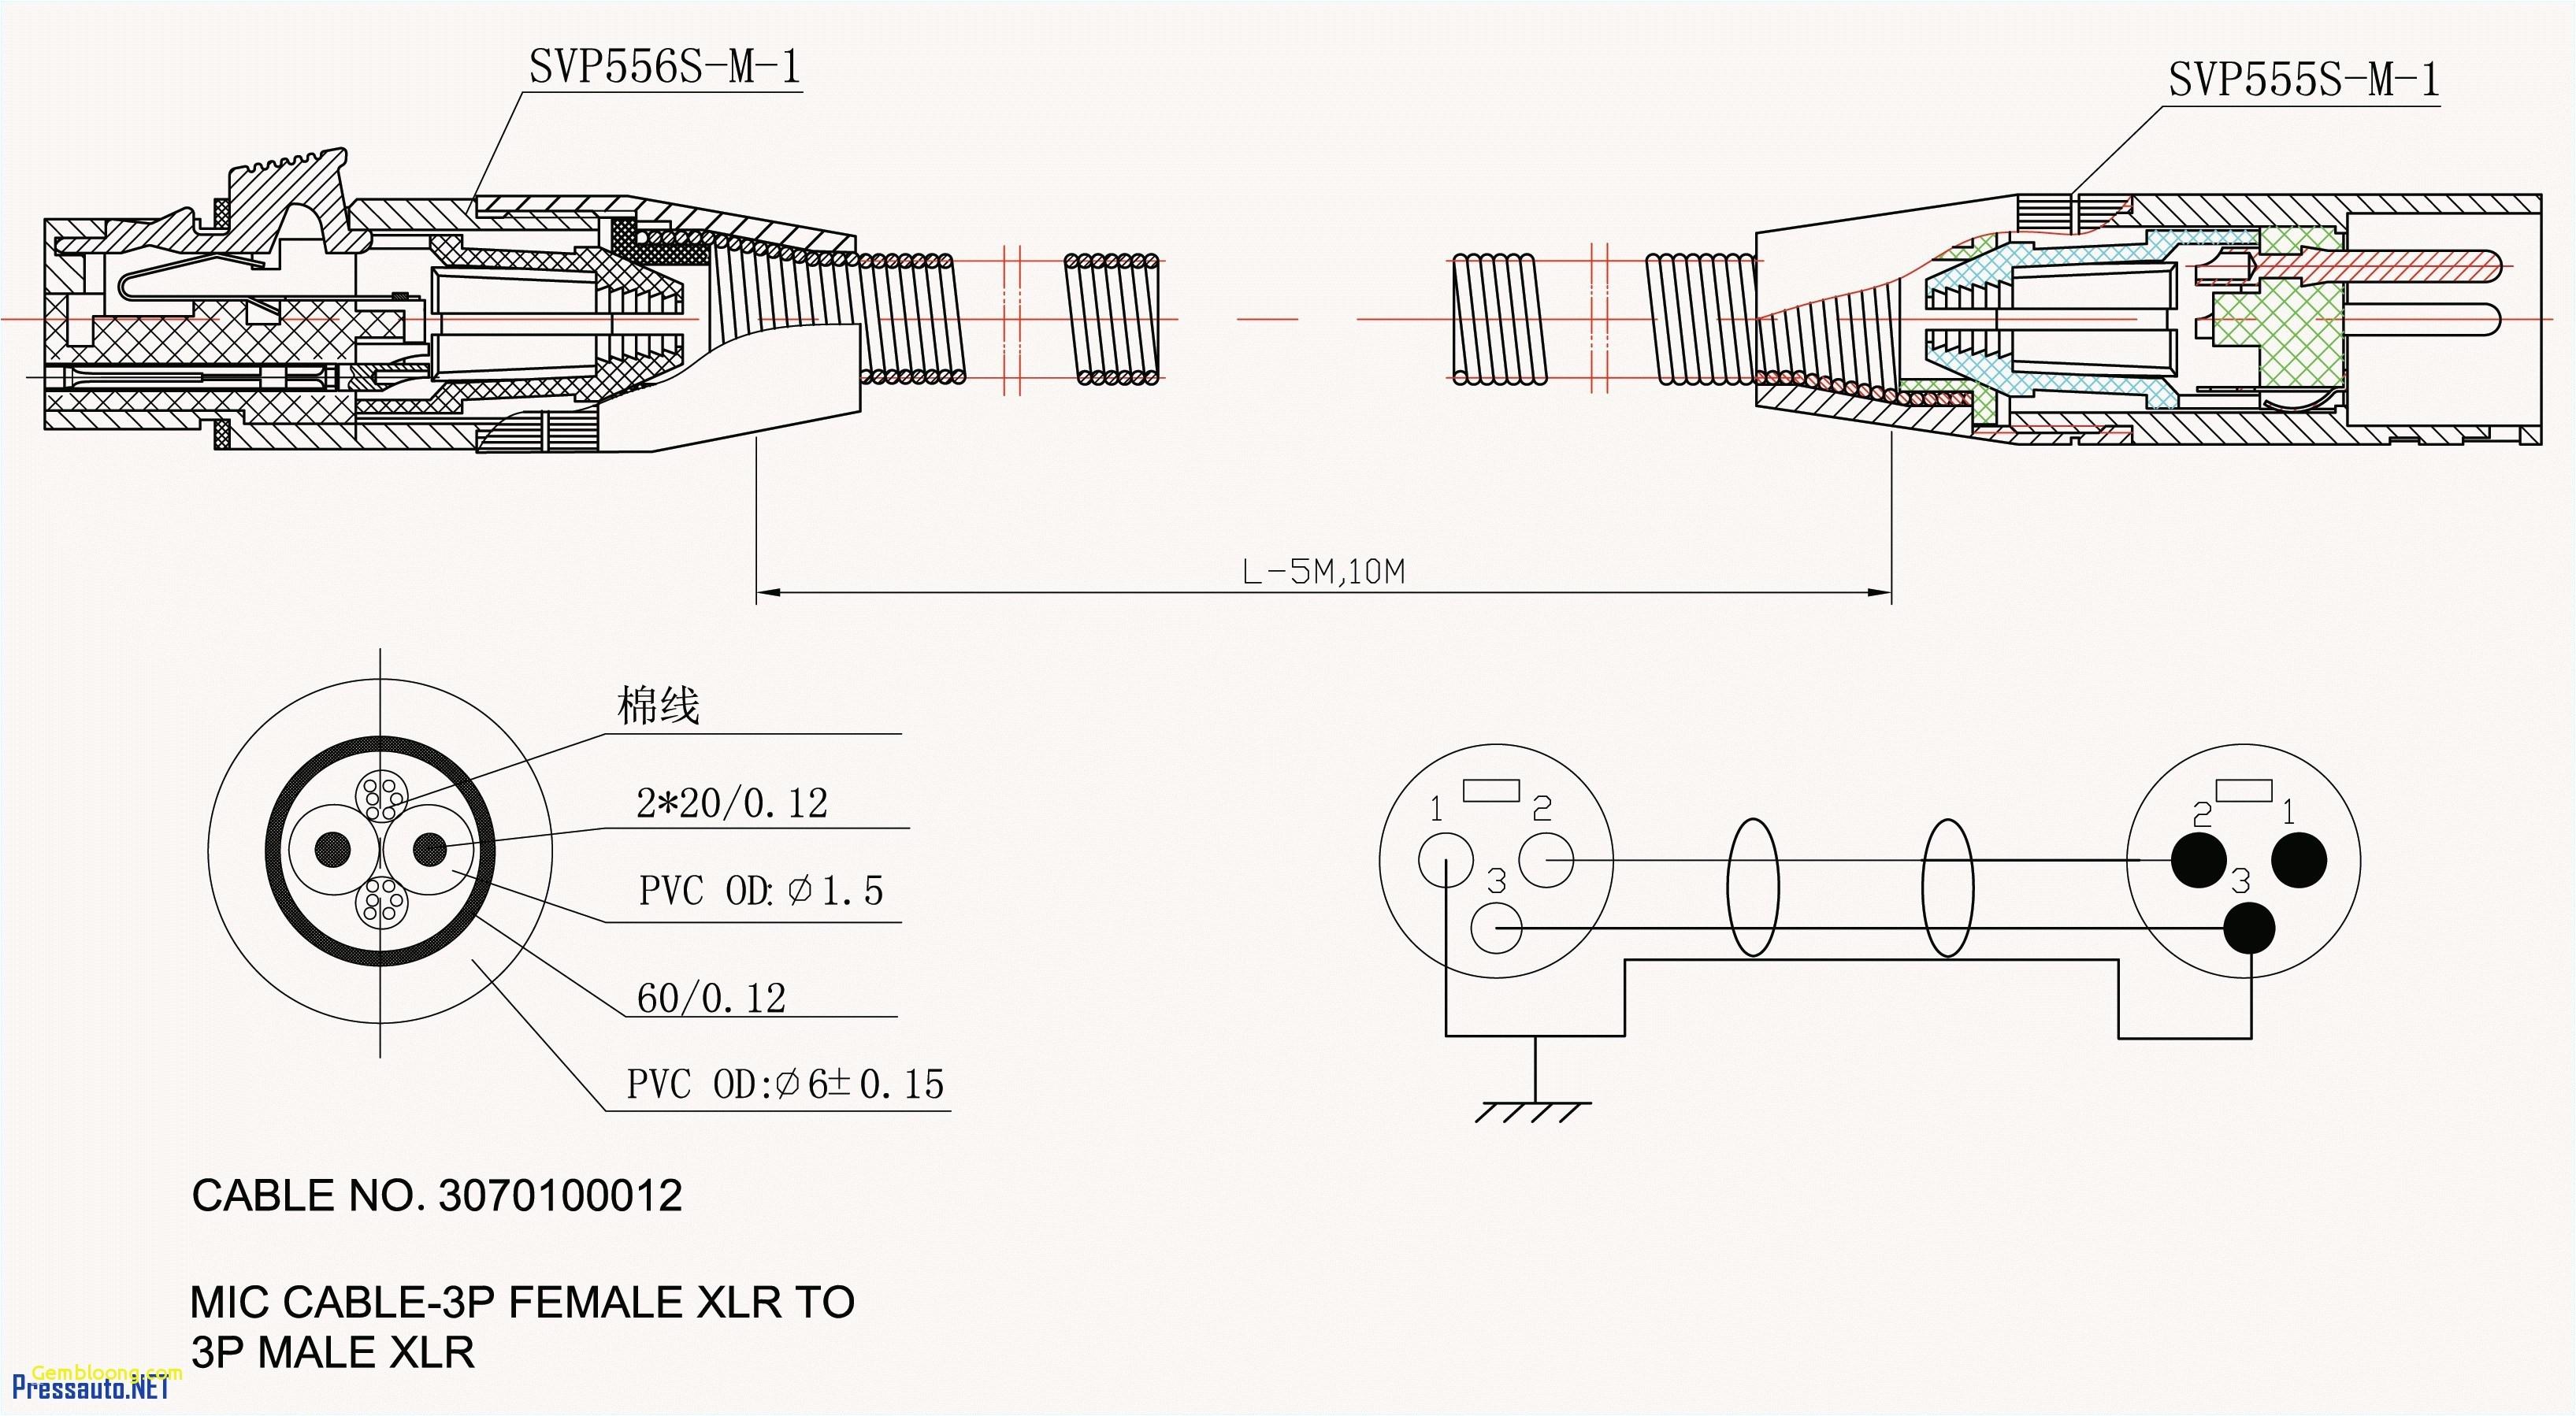 ew 36 wiring diagram wiring diagram expert ew 36 wiring diagram